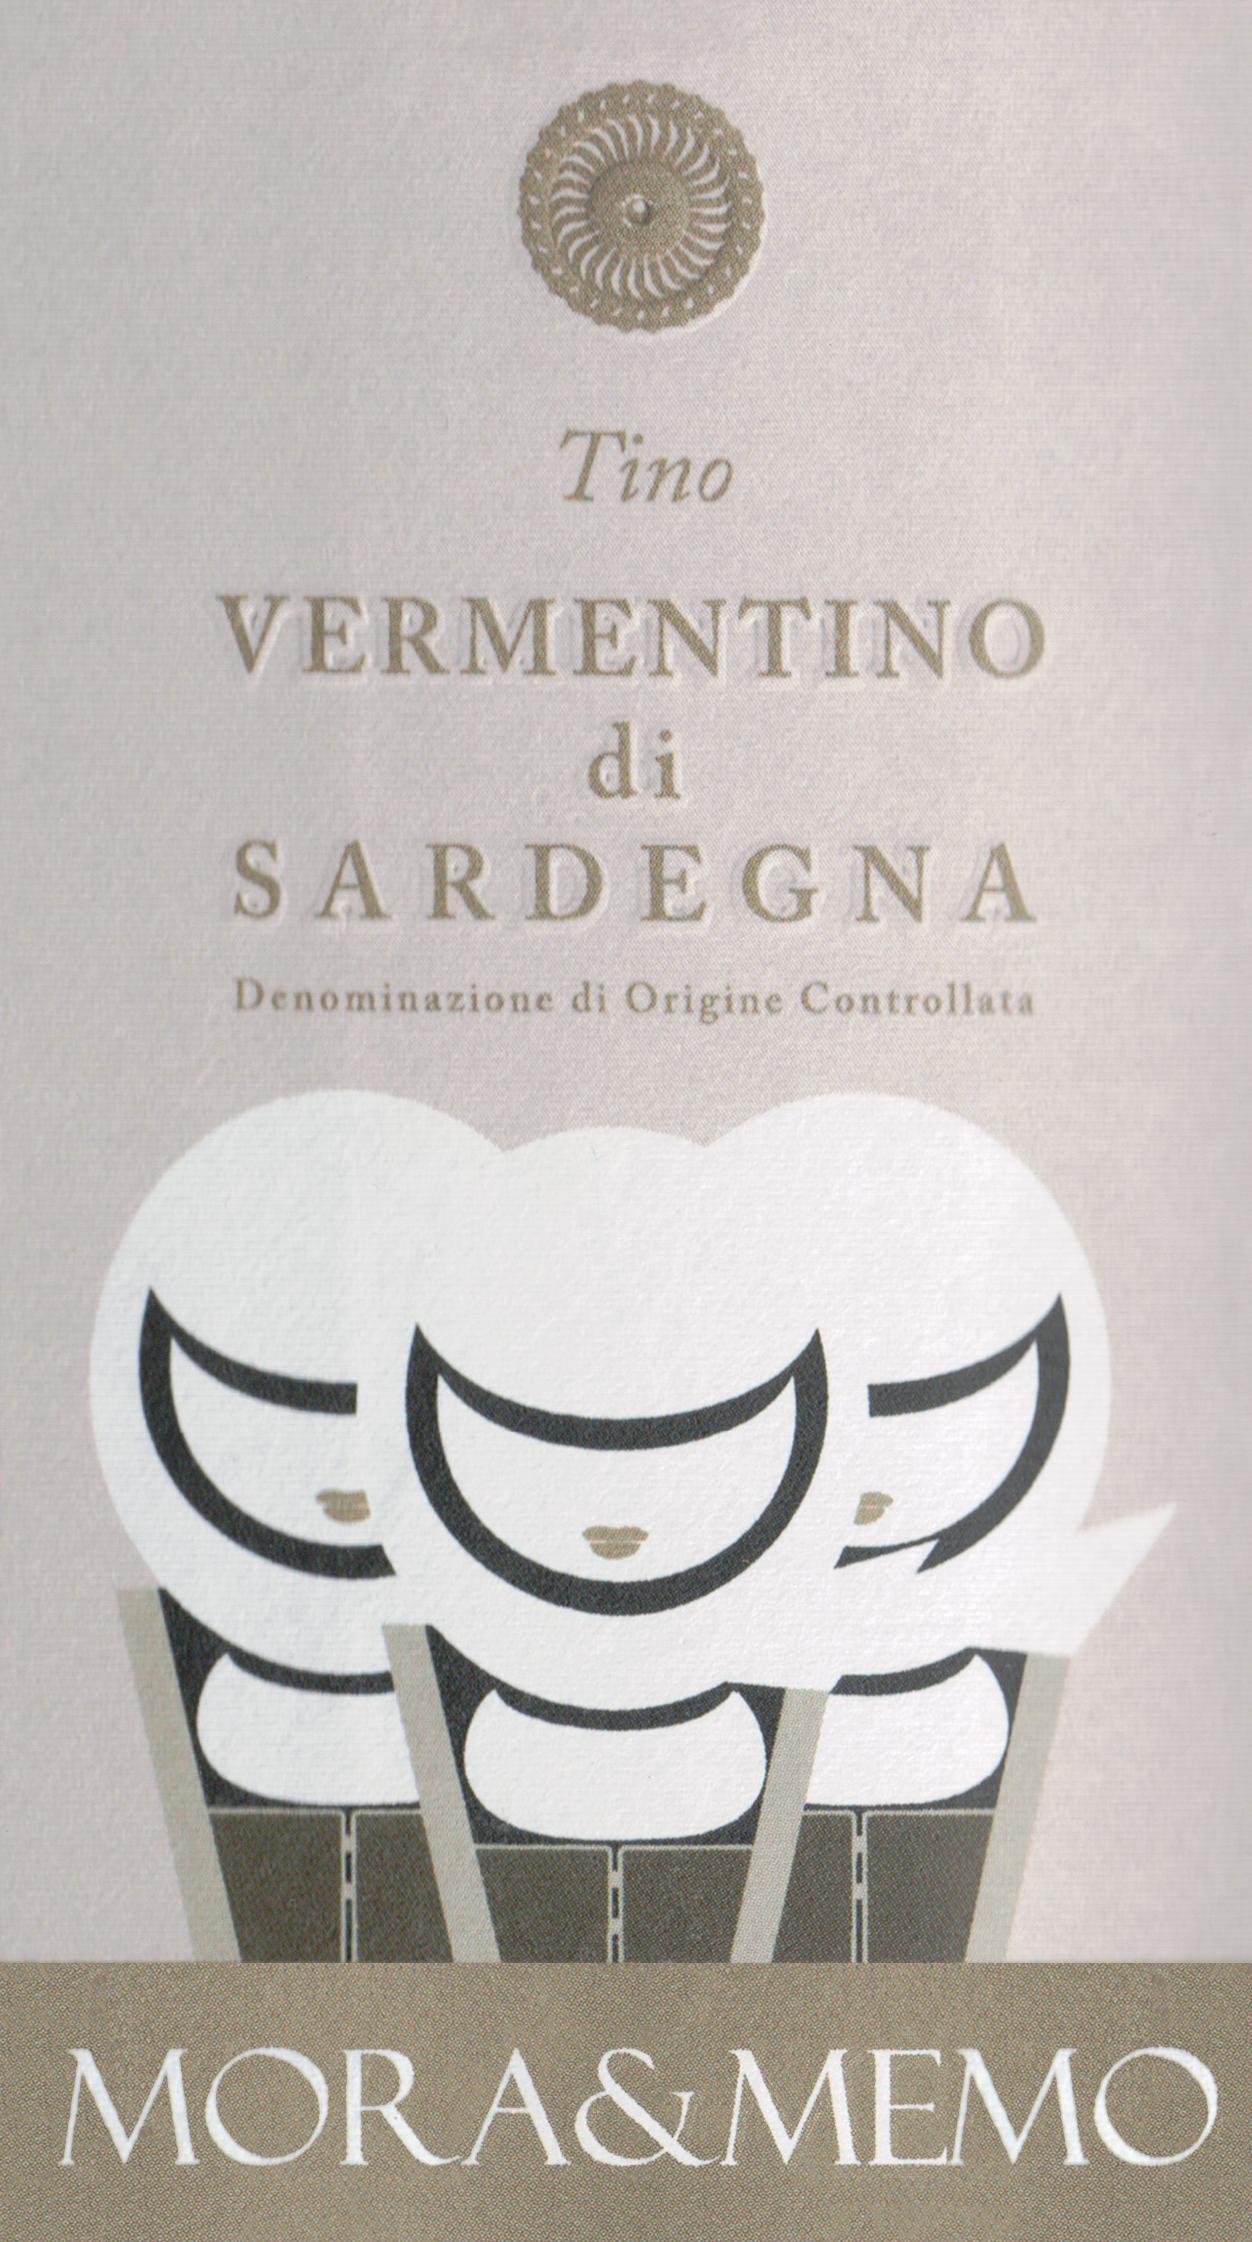 Mora & Memo Tino Vermentino Di Sardegna 2018